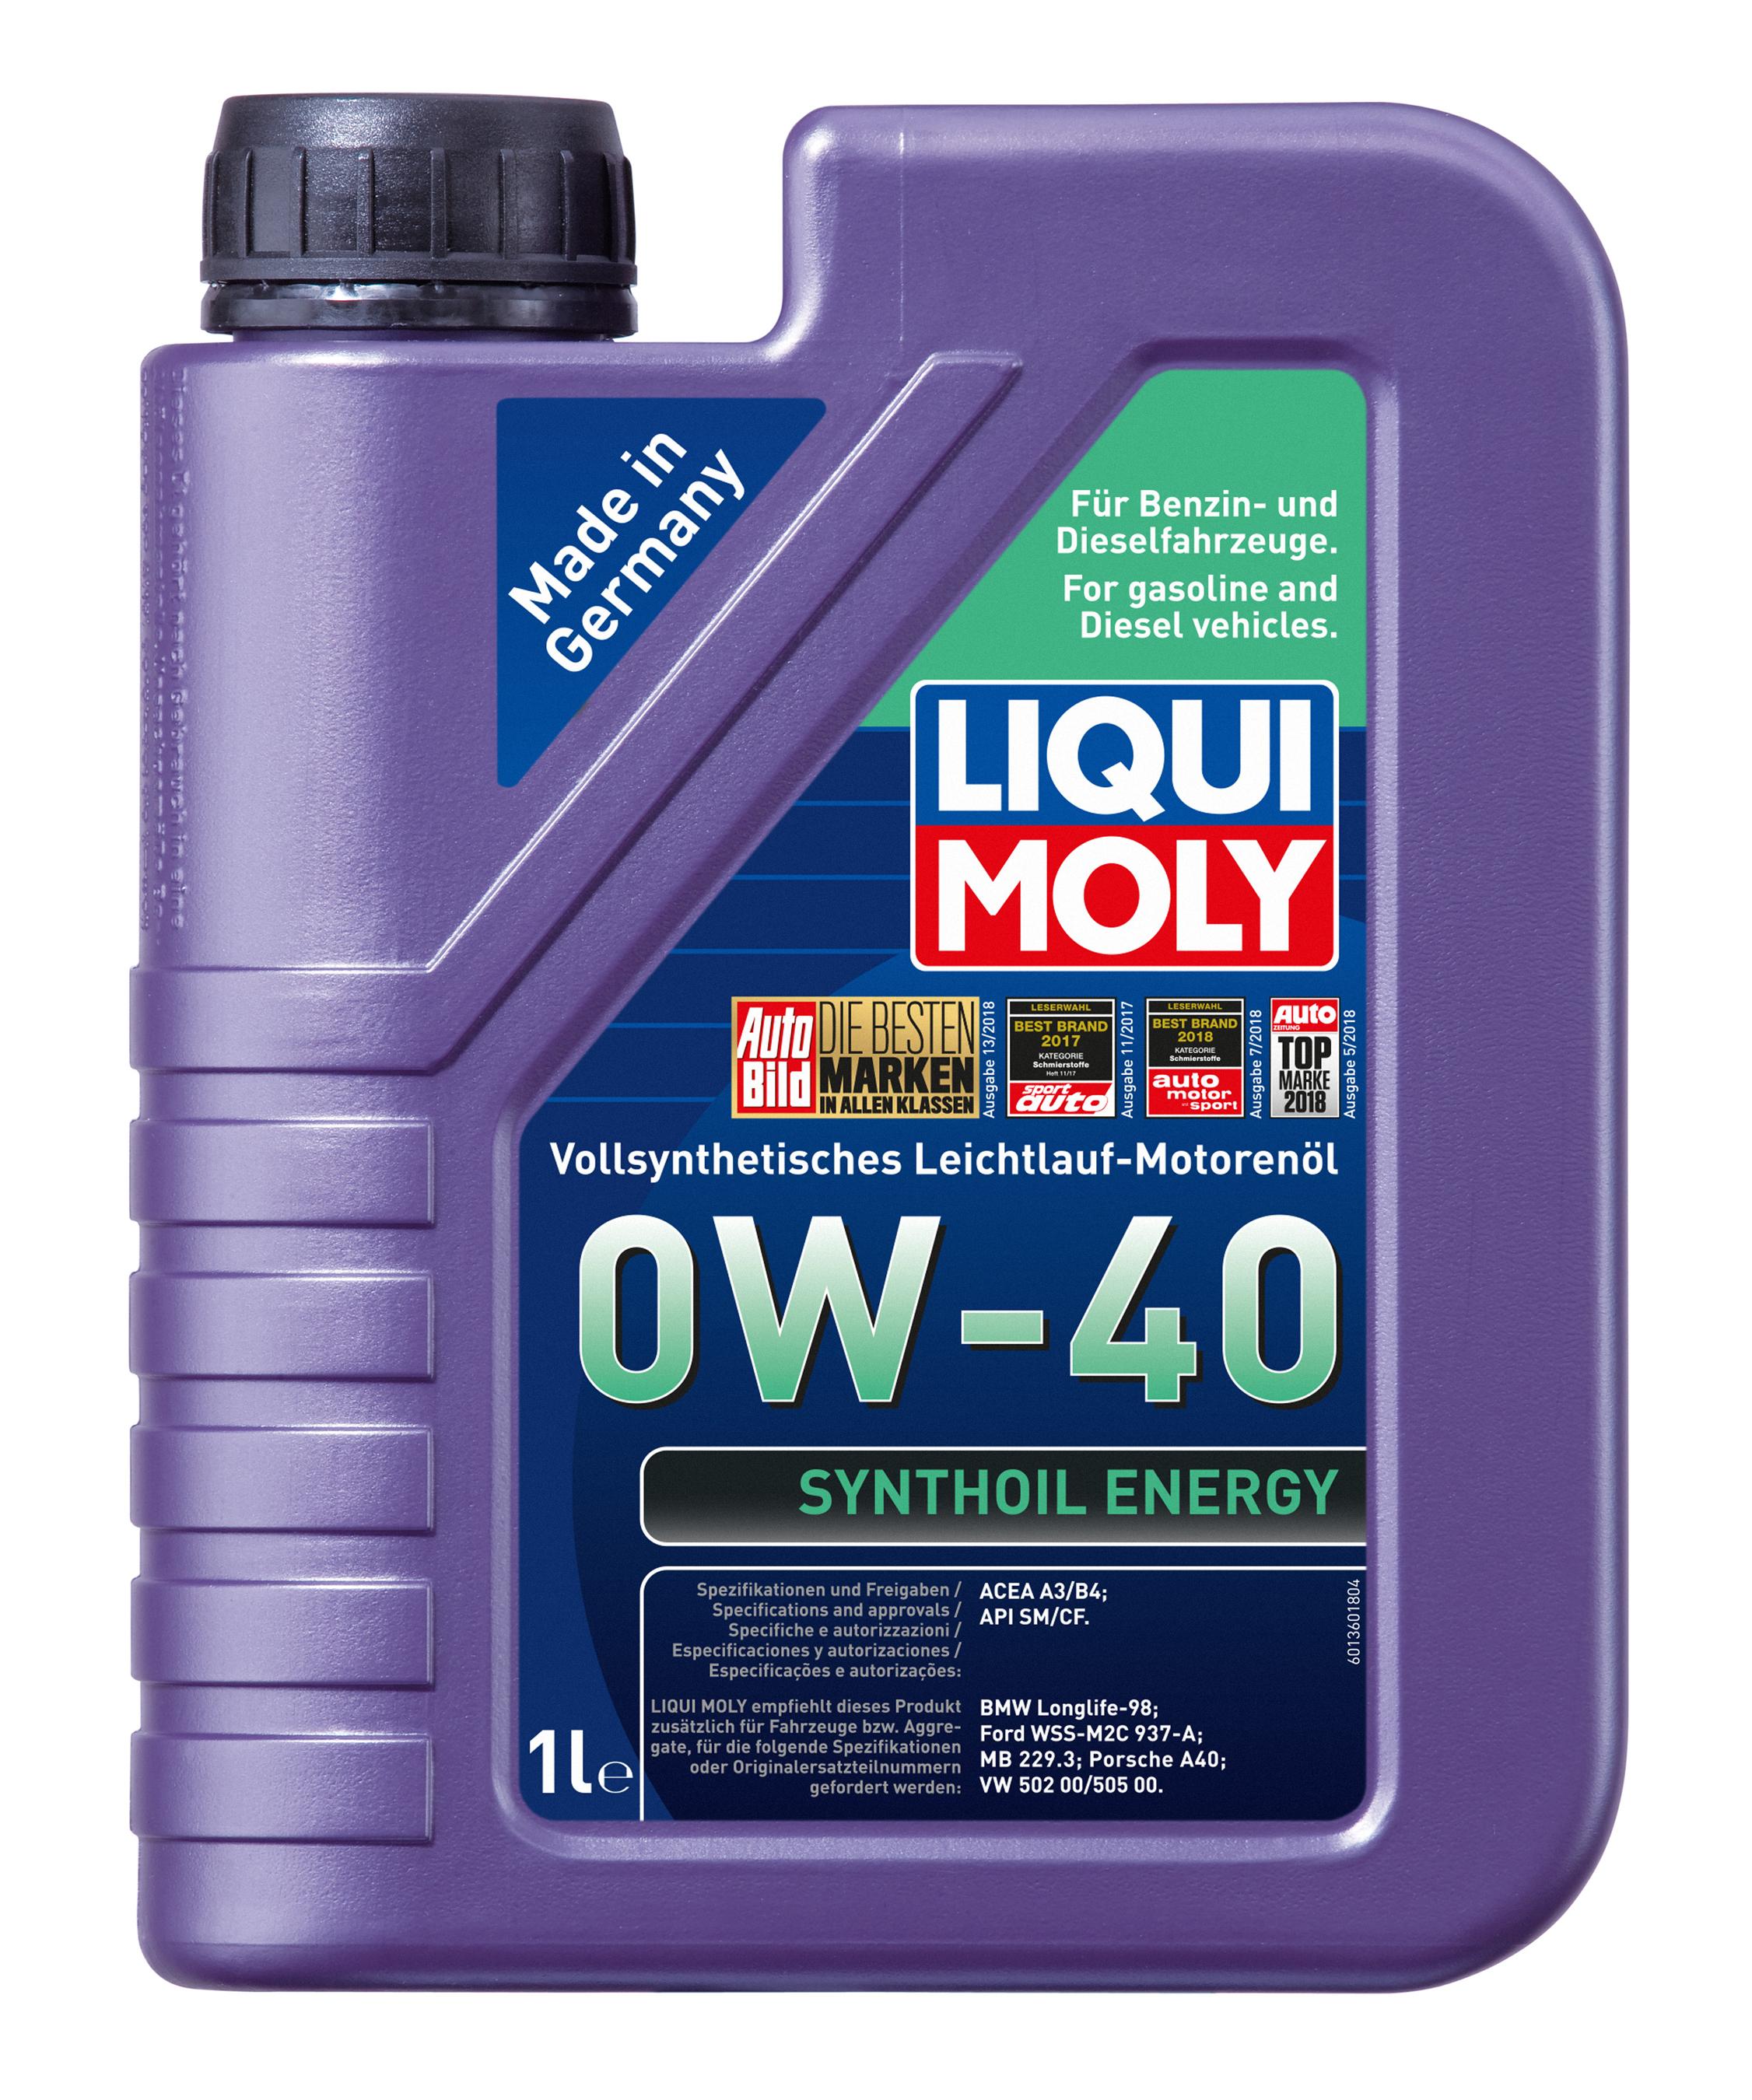 Liqui Moly Leichtlaufmotoröl Synthoil Energy 0W-40  1 Liter Bild 1